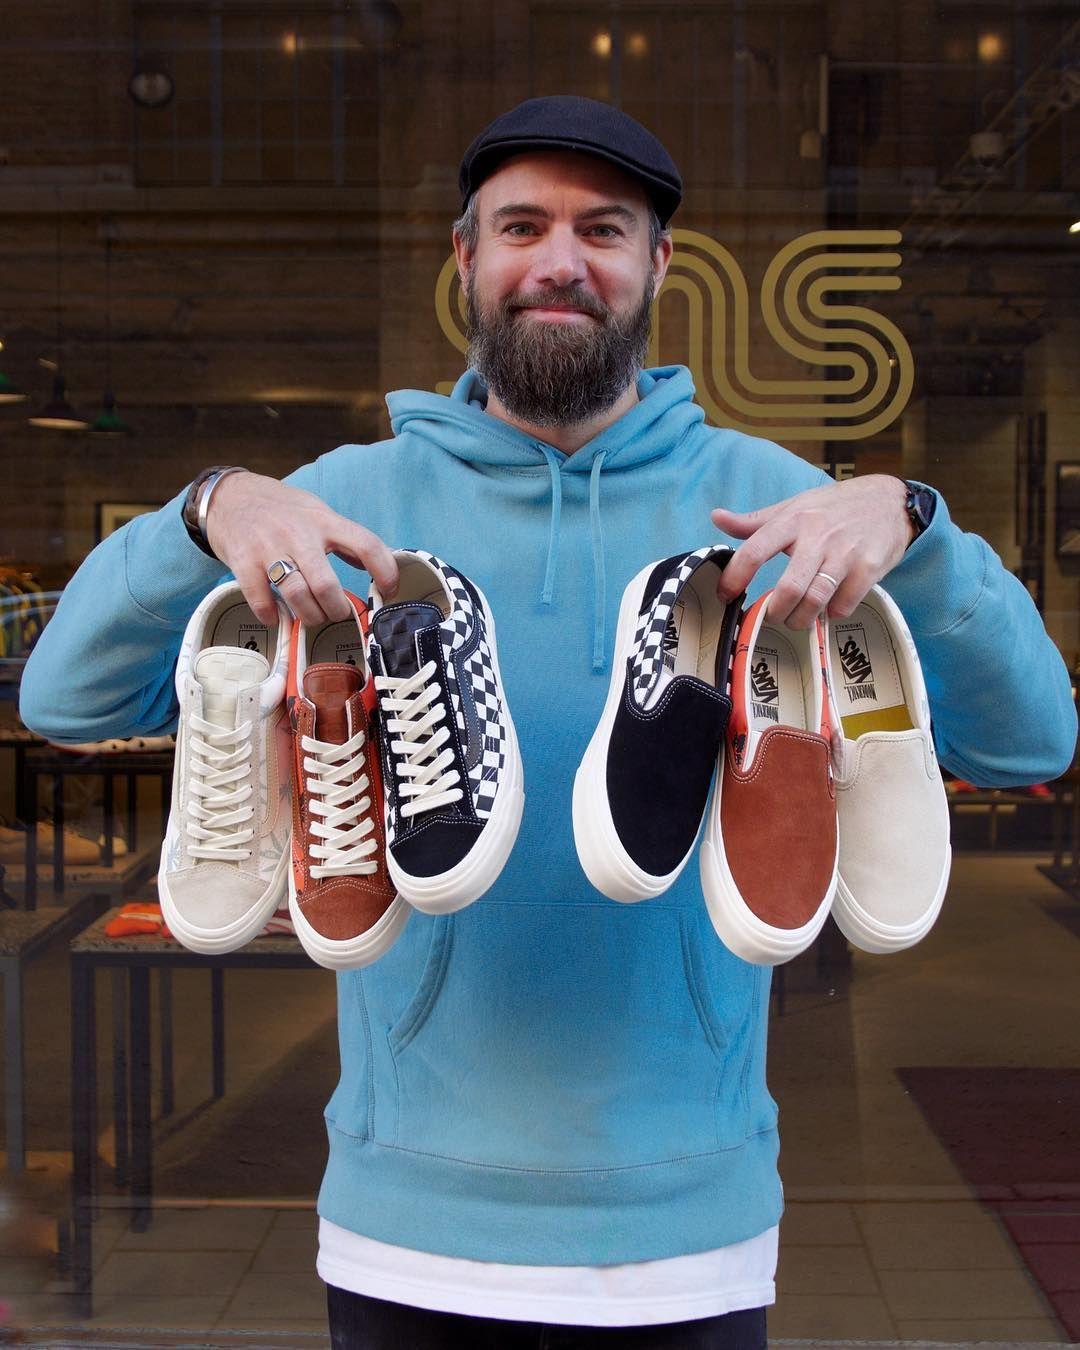 Fear of God x Vans Sk8 Hi 2016 (by spatd0) | Vans shoes